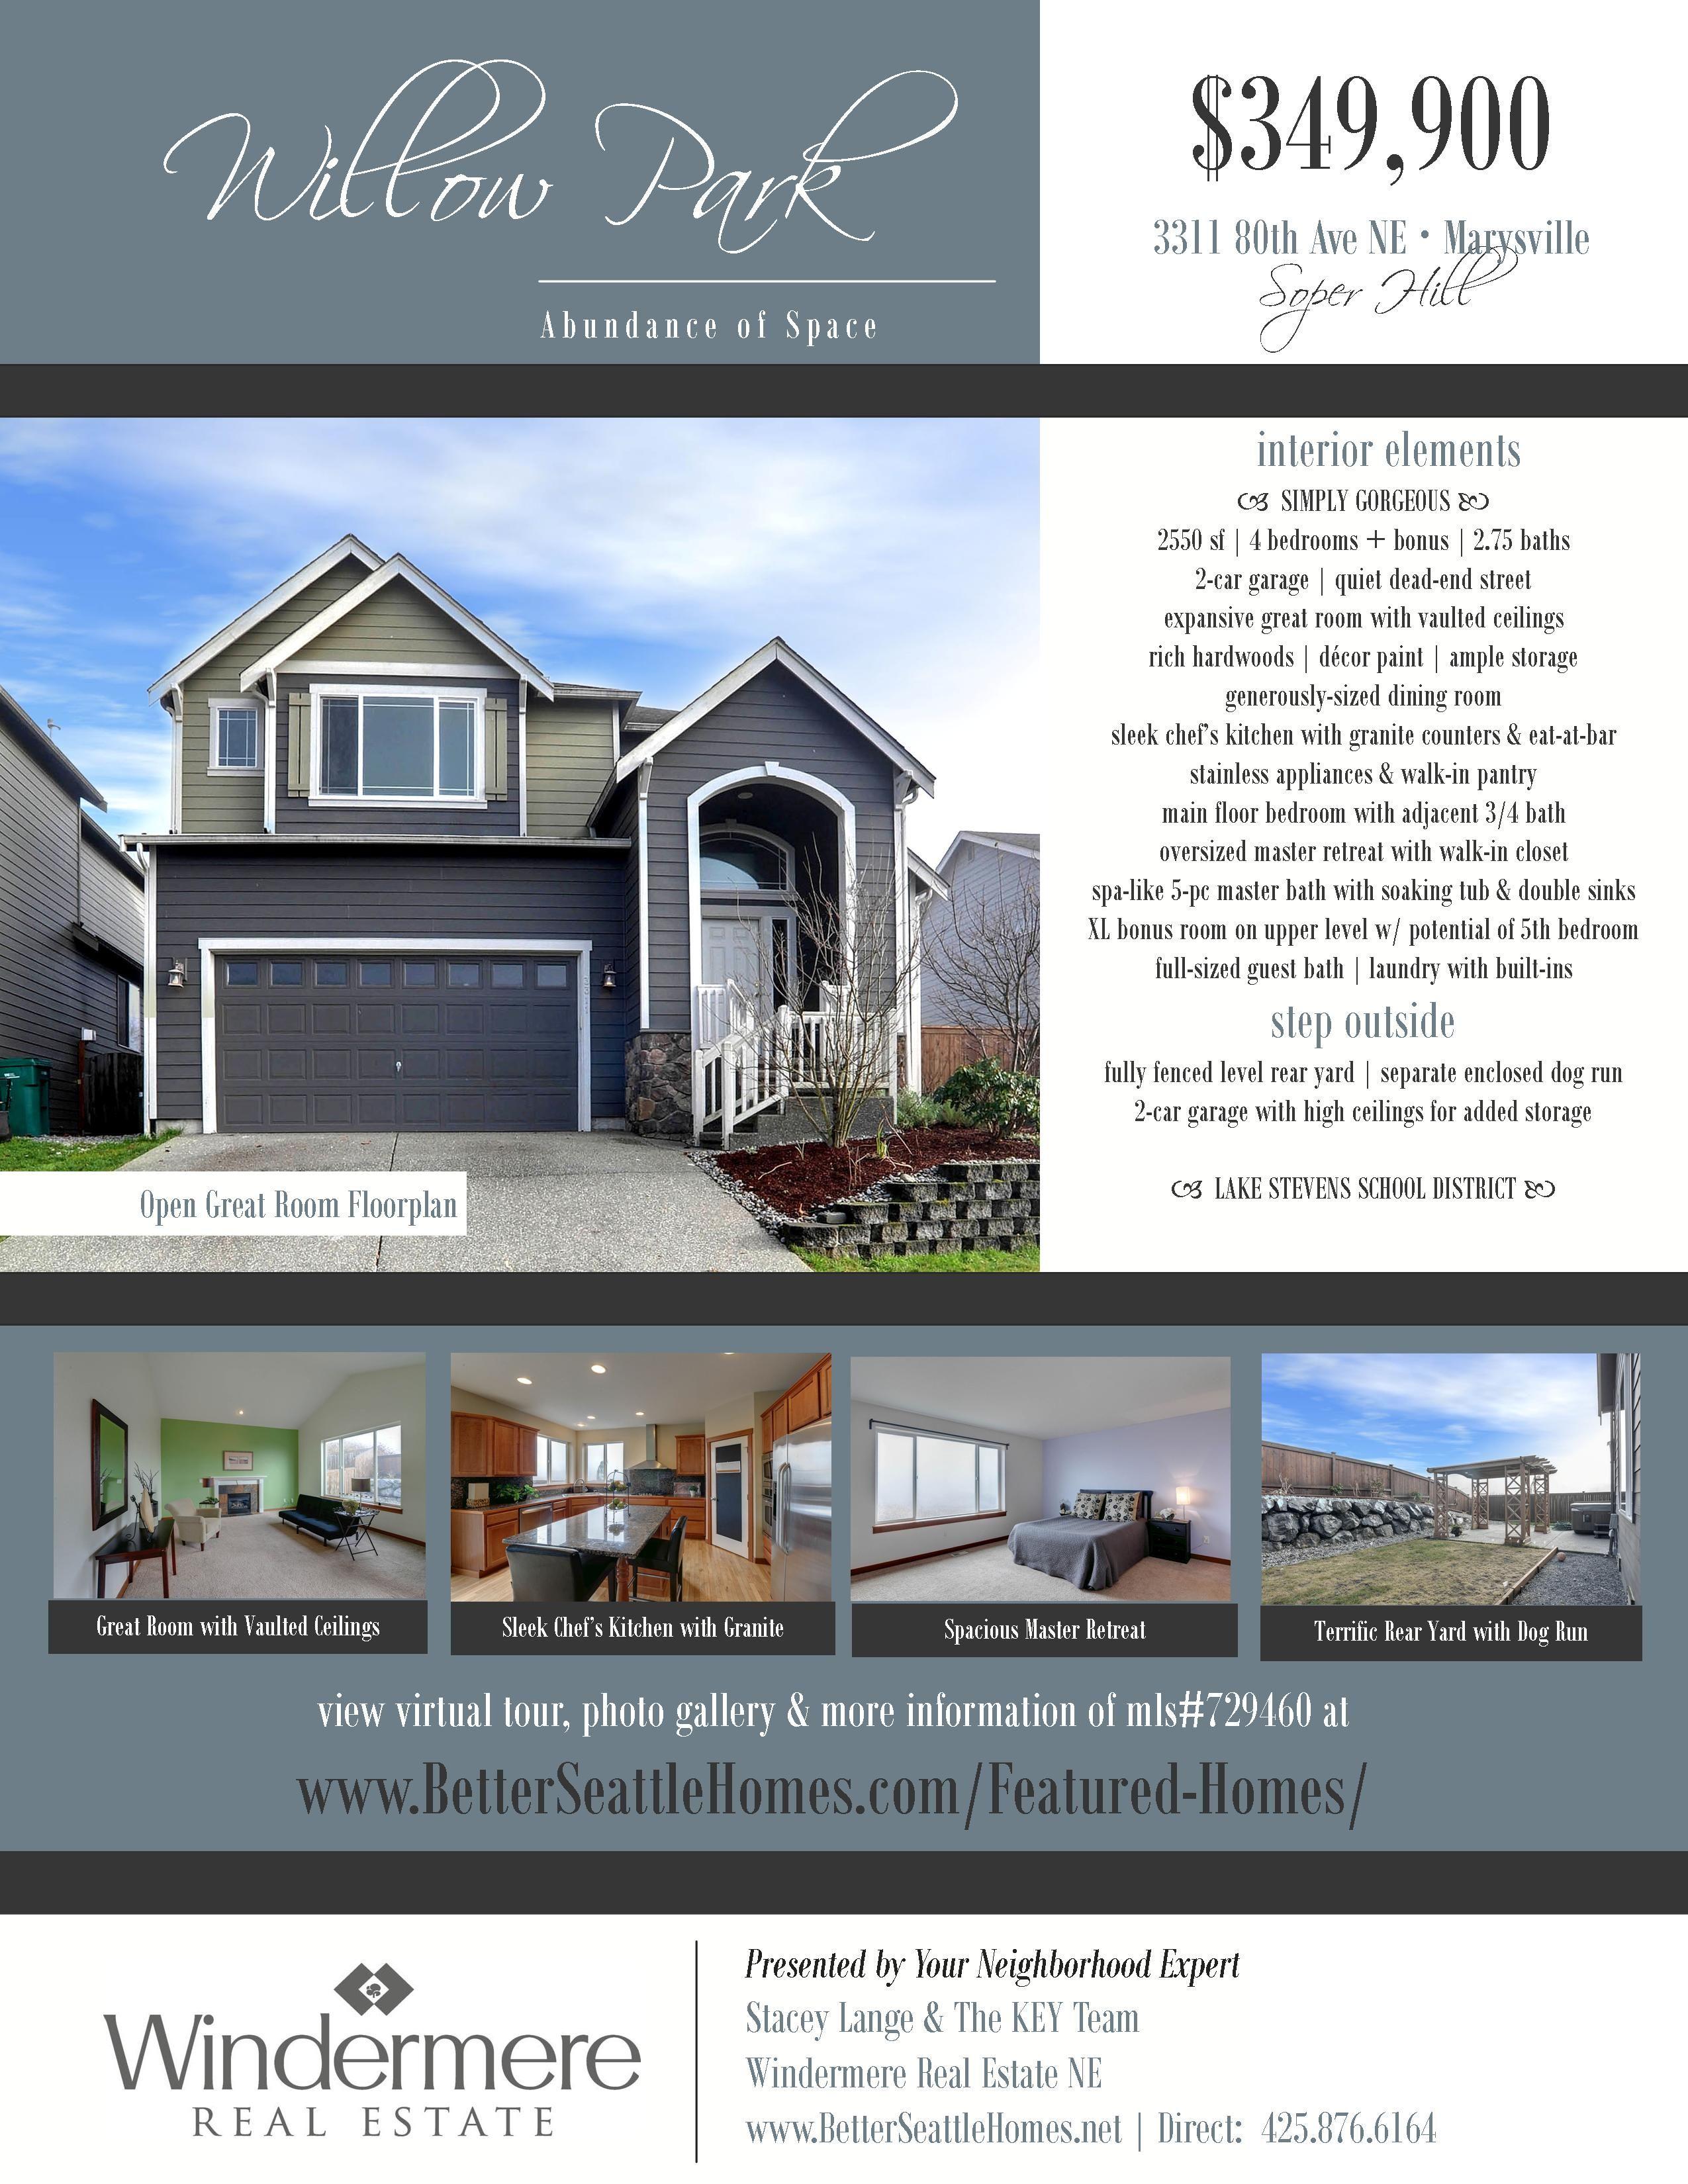 Dream Home Real Estate Flyer Design Real Estate Houses Real Estate Flyers Real Estate Flyer Template